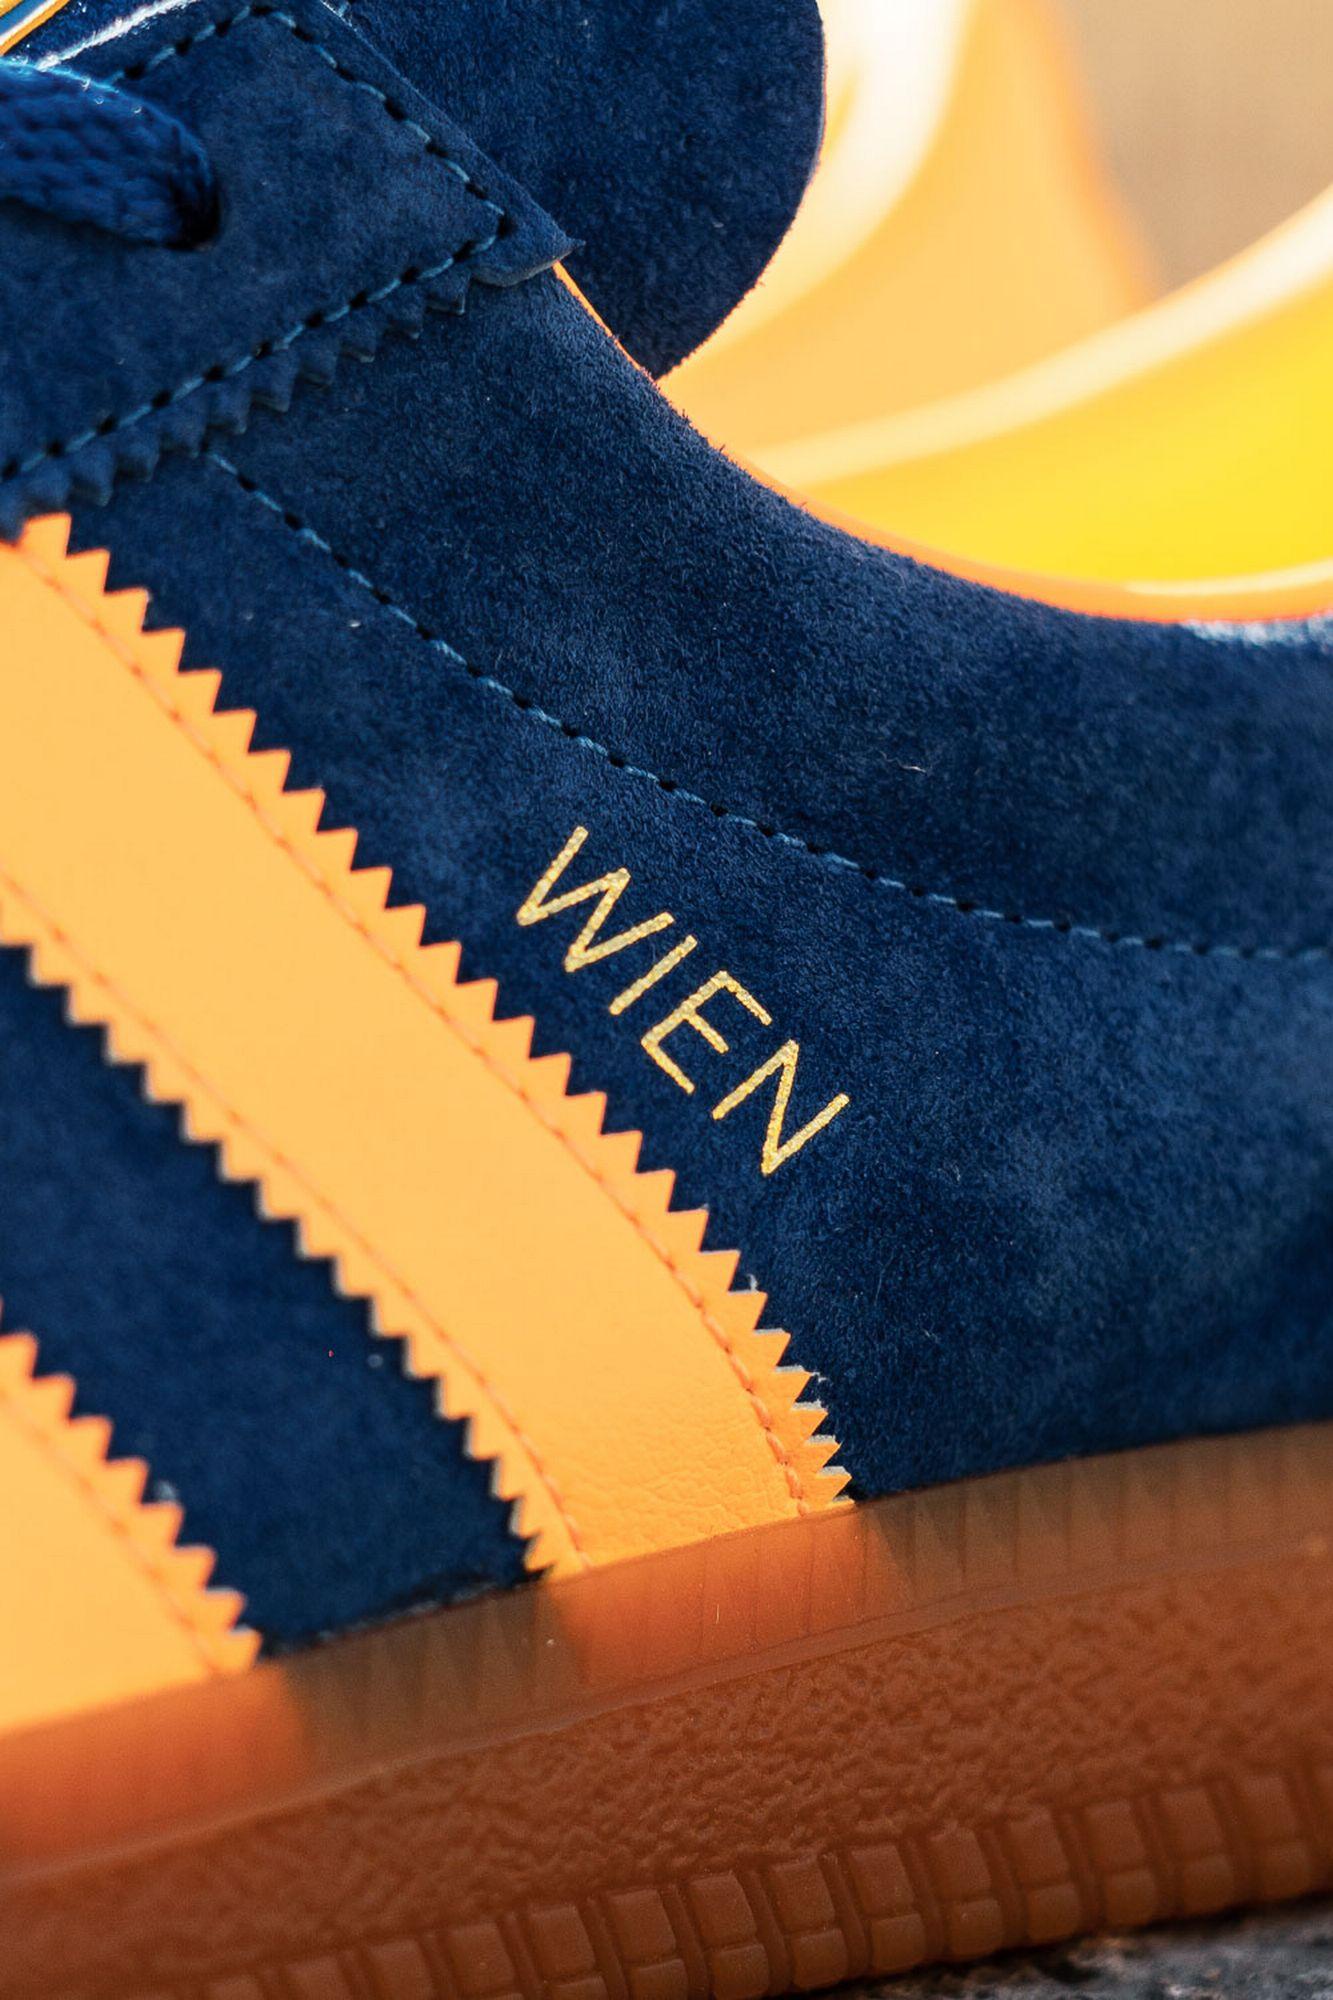 adidas WIEN - City Series - close up